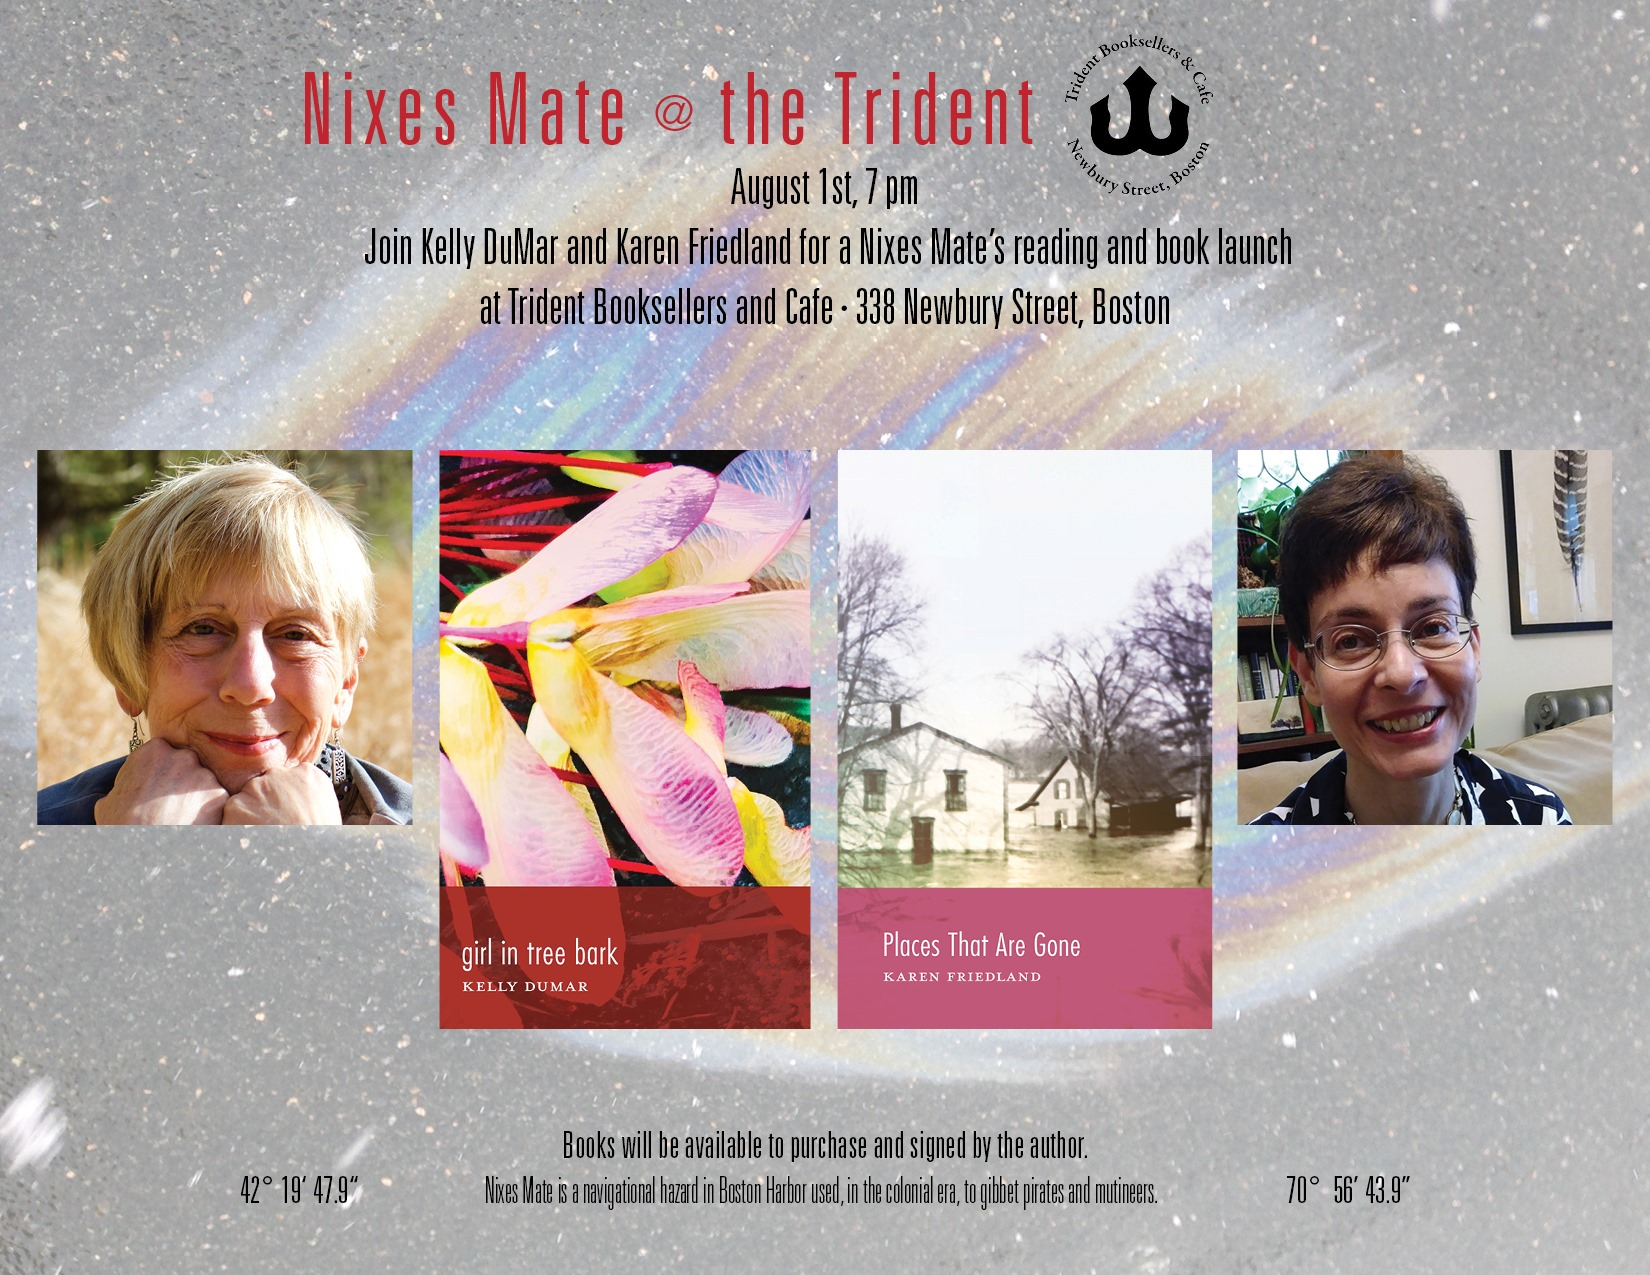 http://www.kellydumar.com/kellys-news-blog/tag/Trident+Booksellers+events